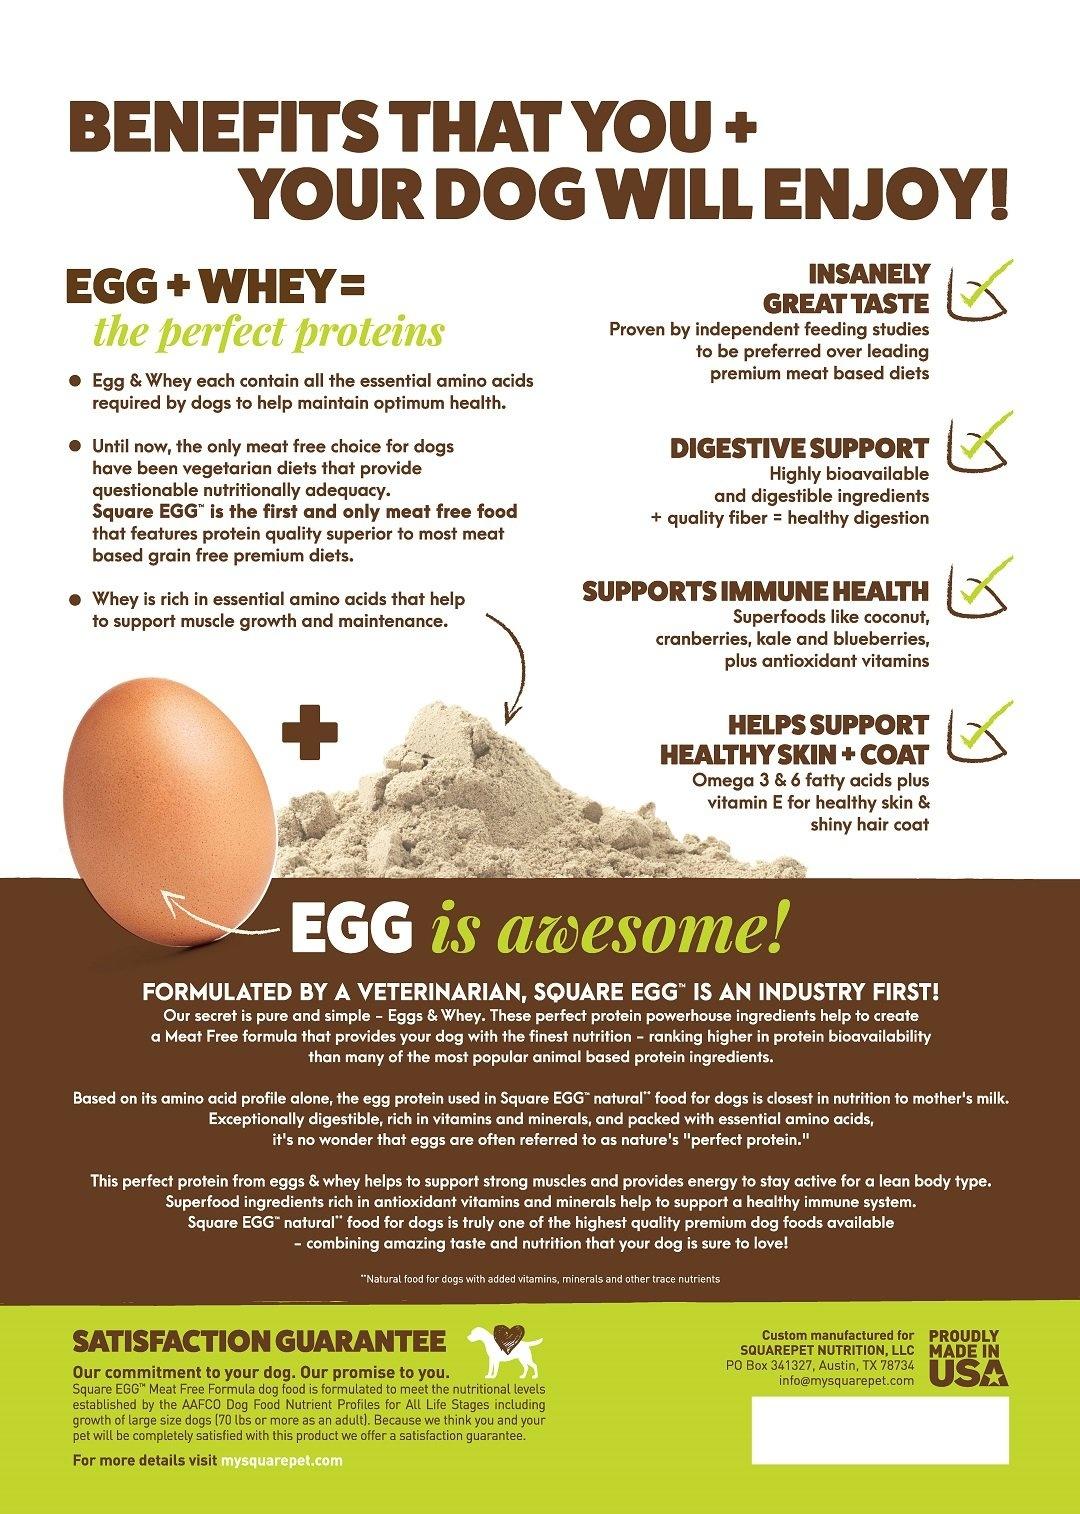 Squarepet Squarepet Square Egg Meat Free Dry Dog Food